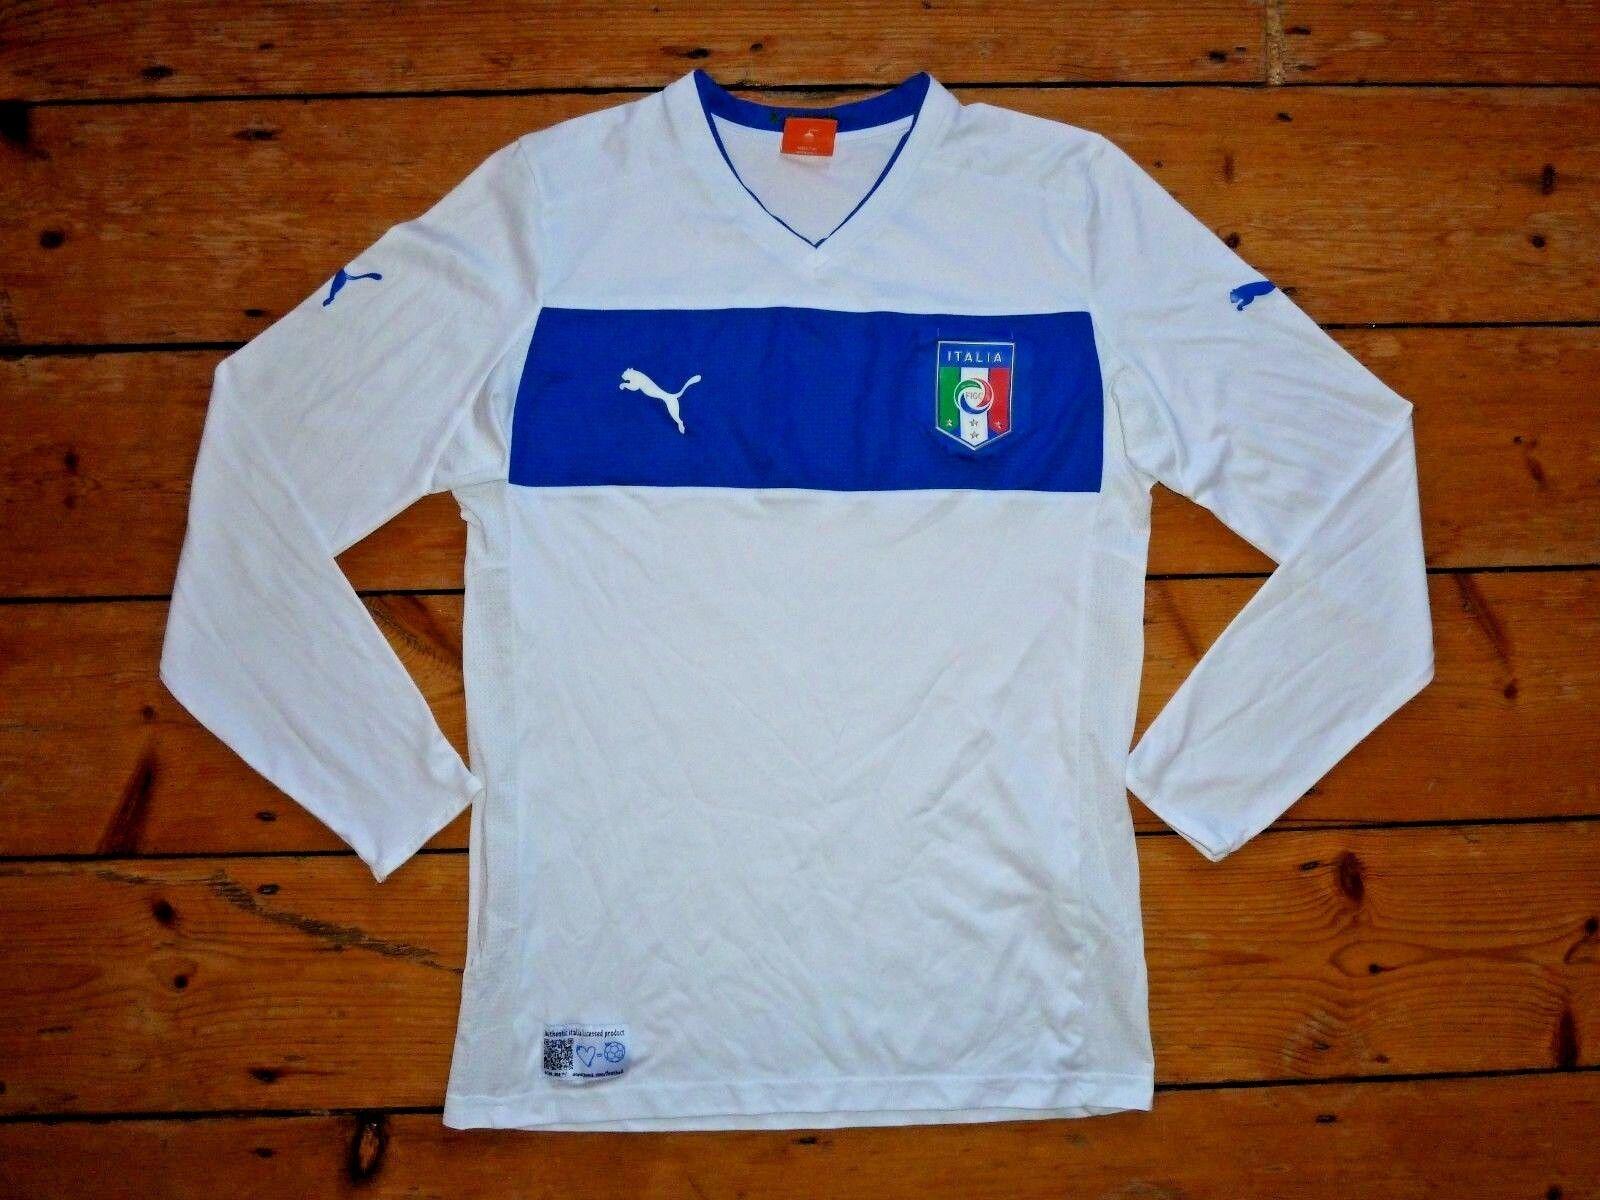 Medium ITALY FOOTBALL SHIRT ITALIA 2012 Soccer JERSEY CAMISETA MAGLlA TRIKOT